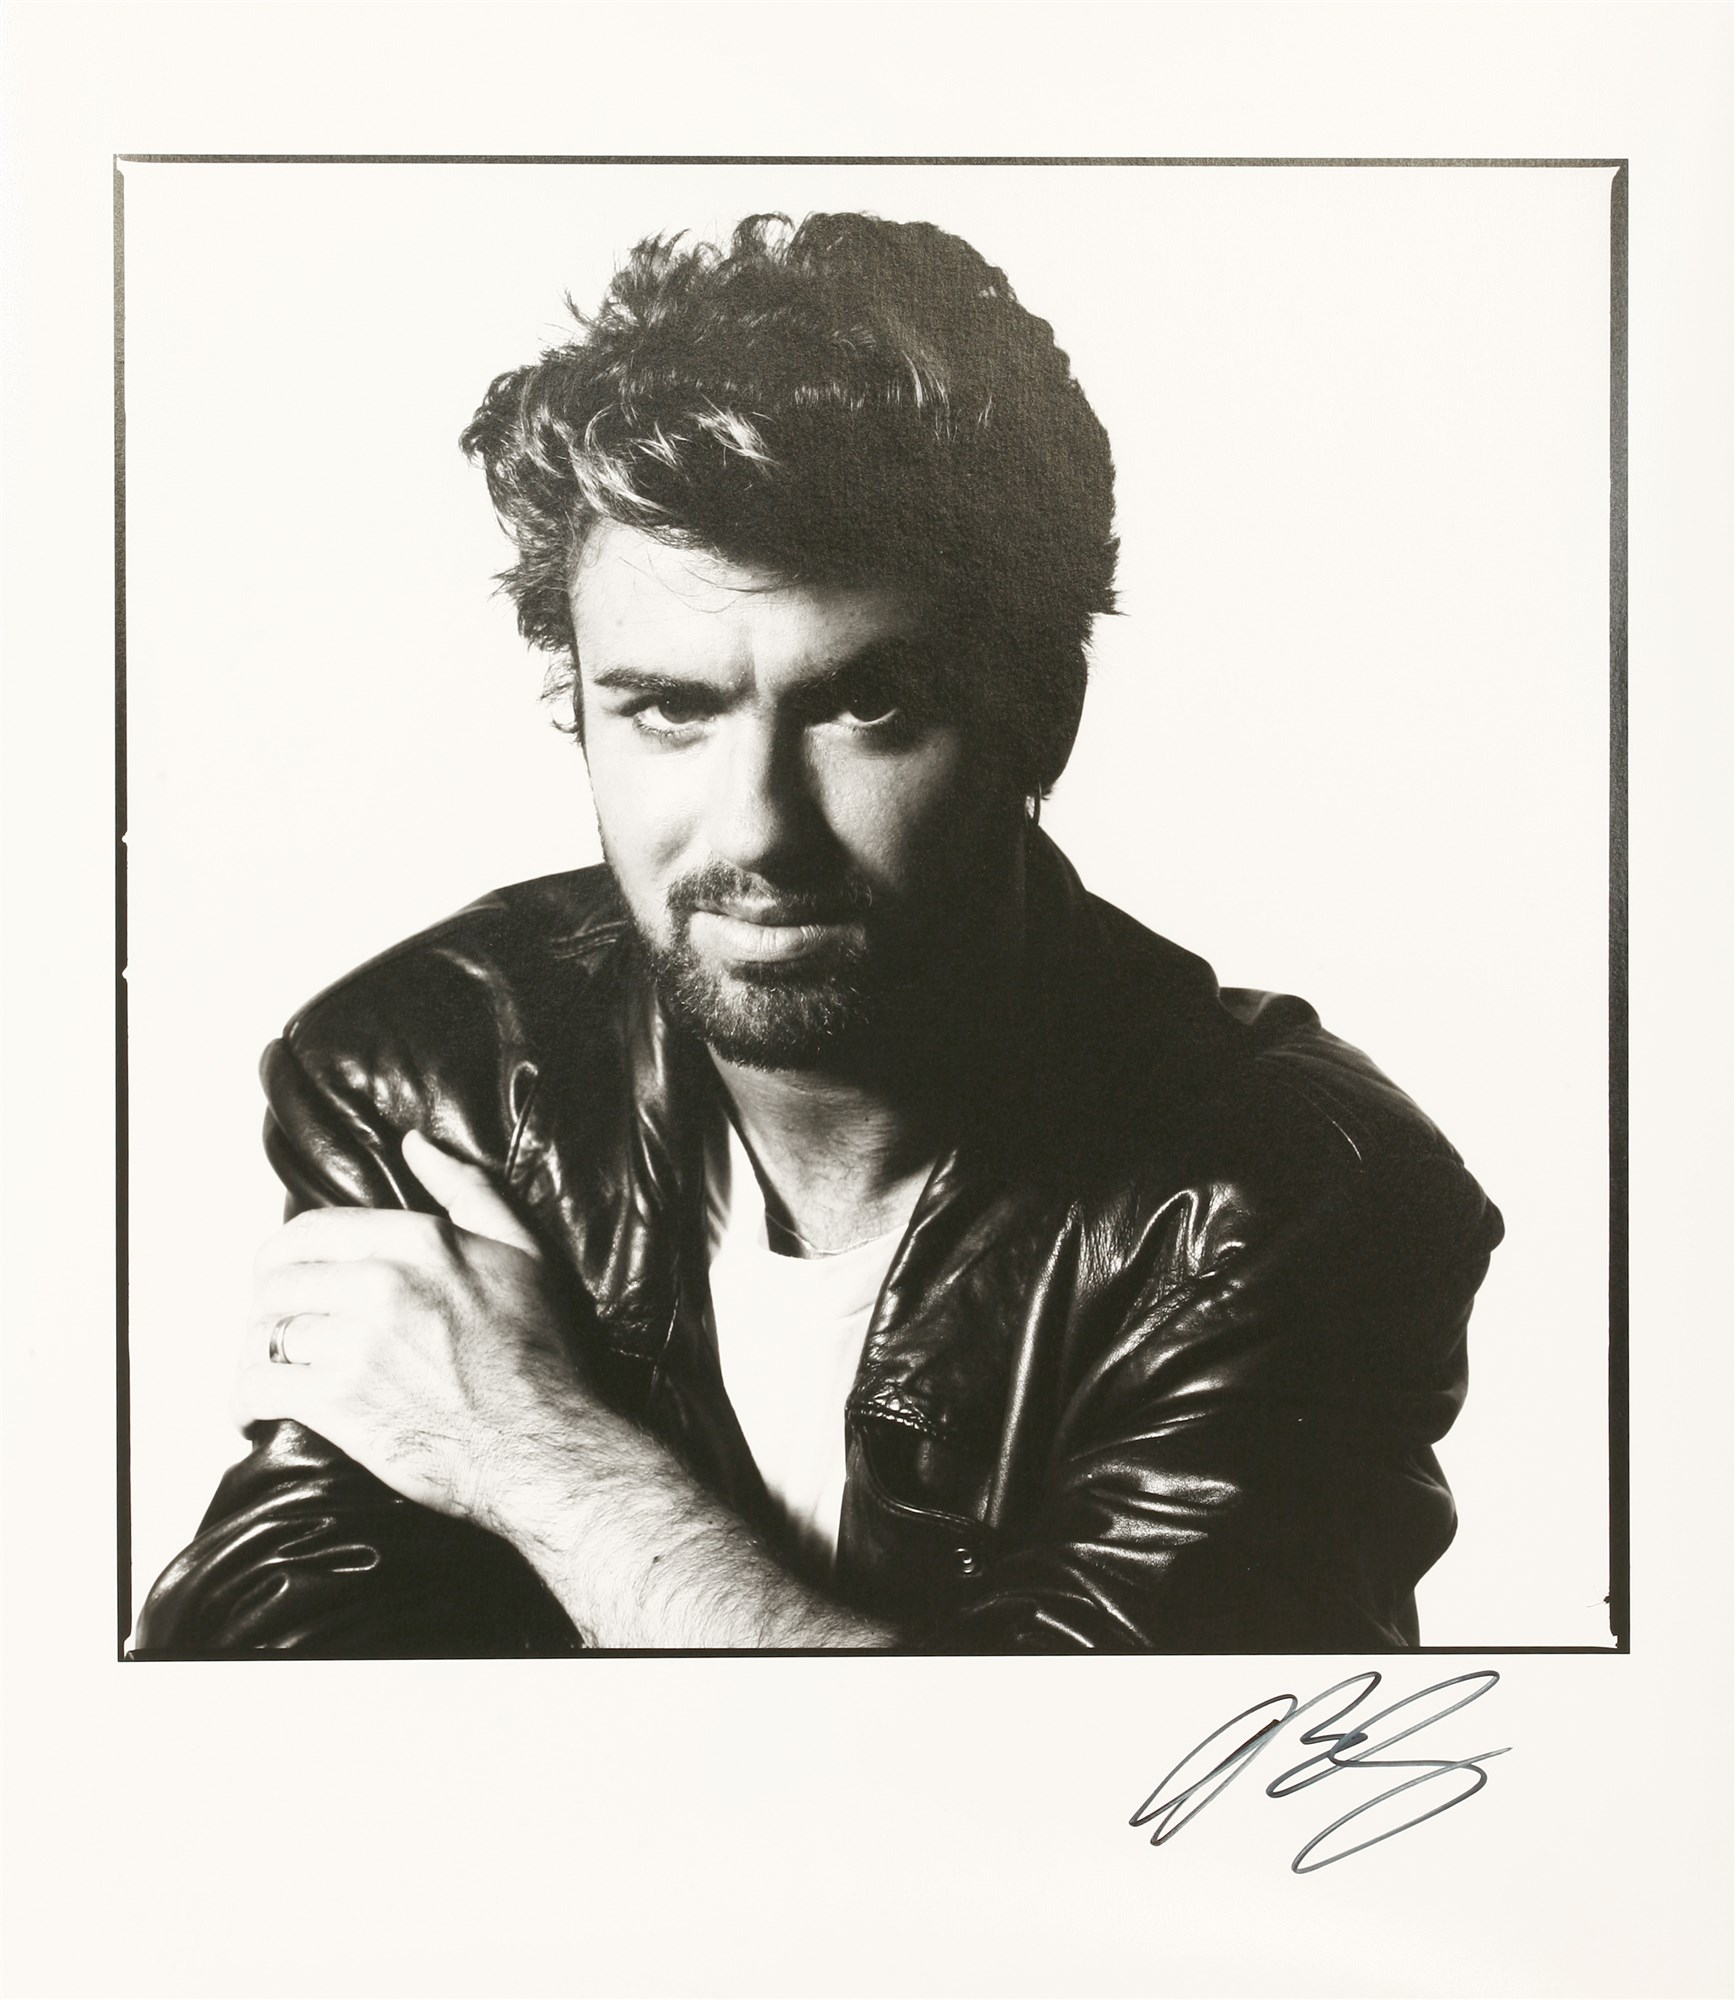 David Bailey Photograph George Michael Live Aid July 1985